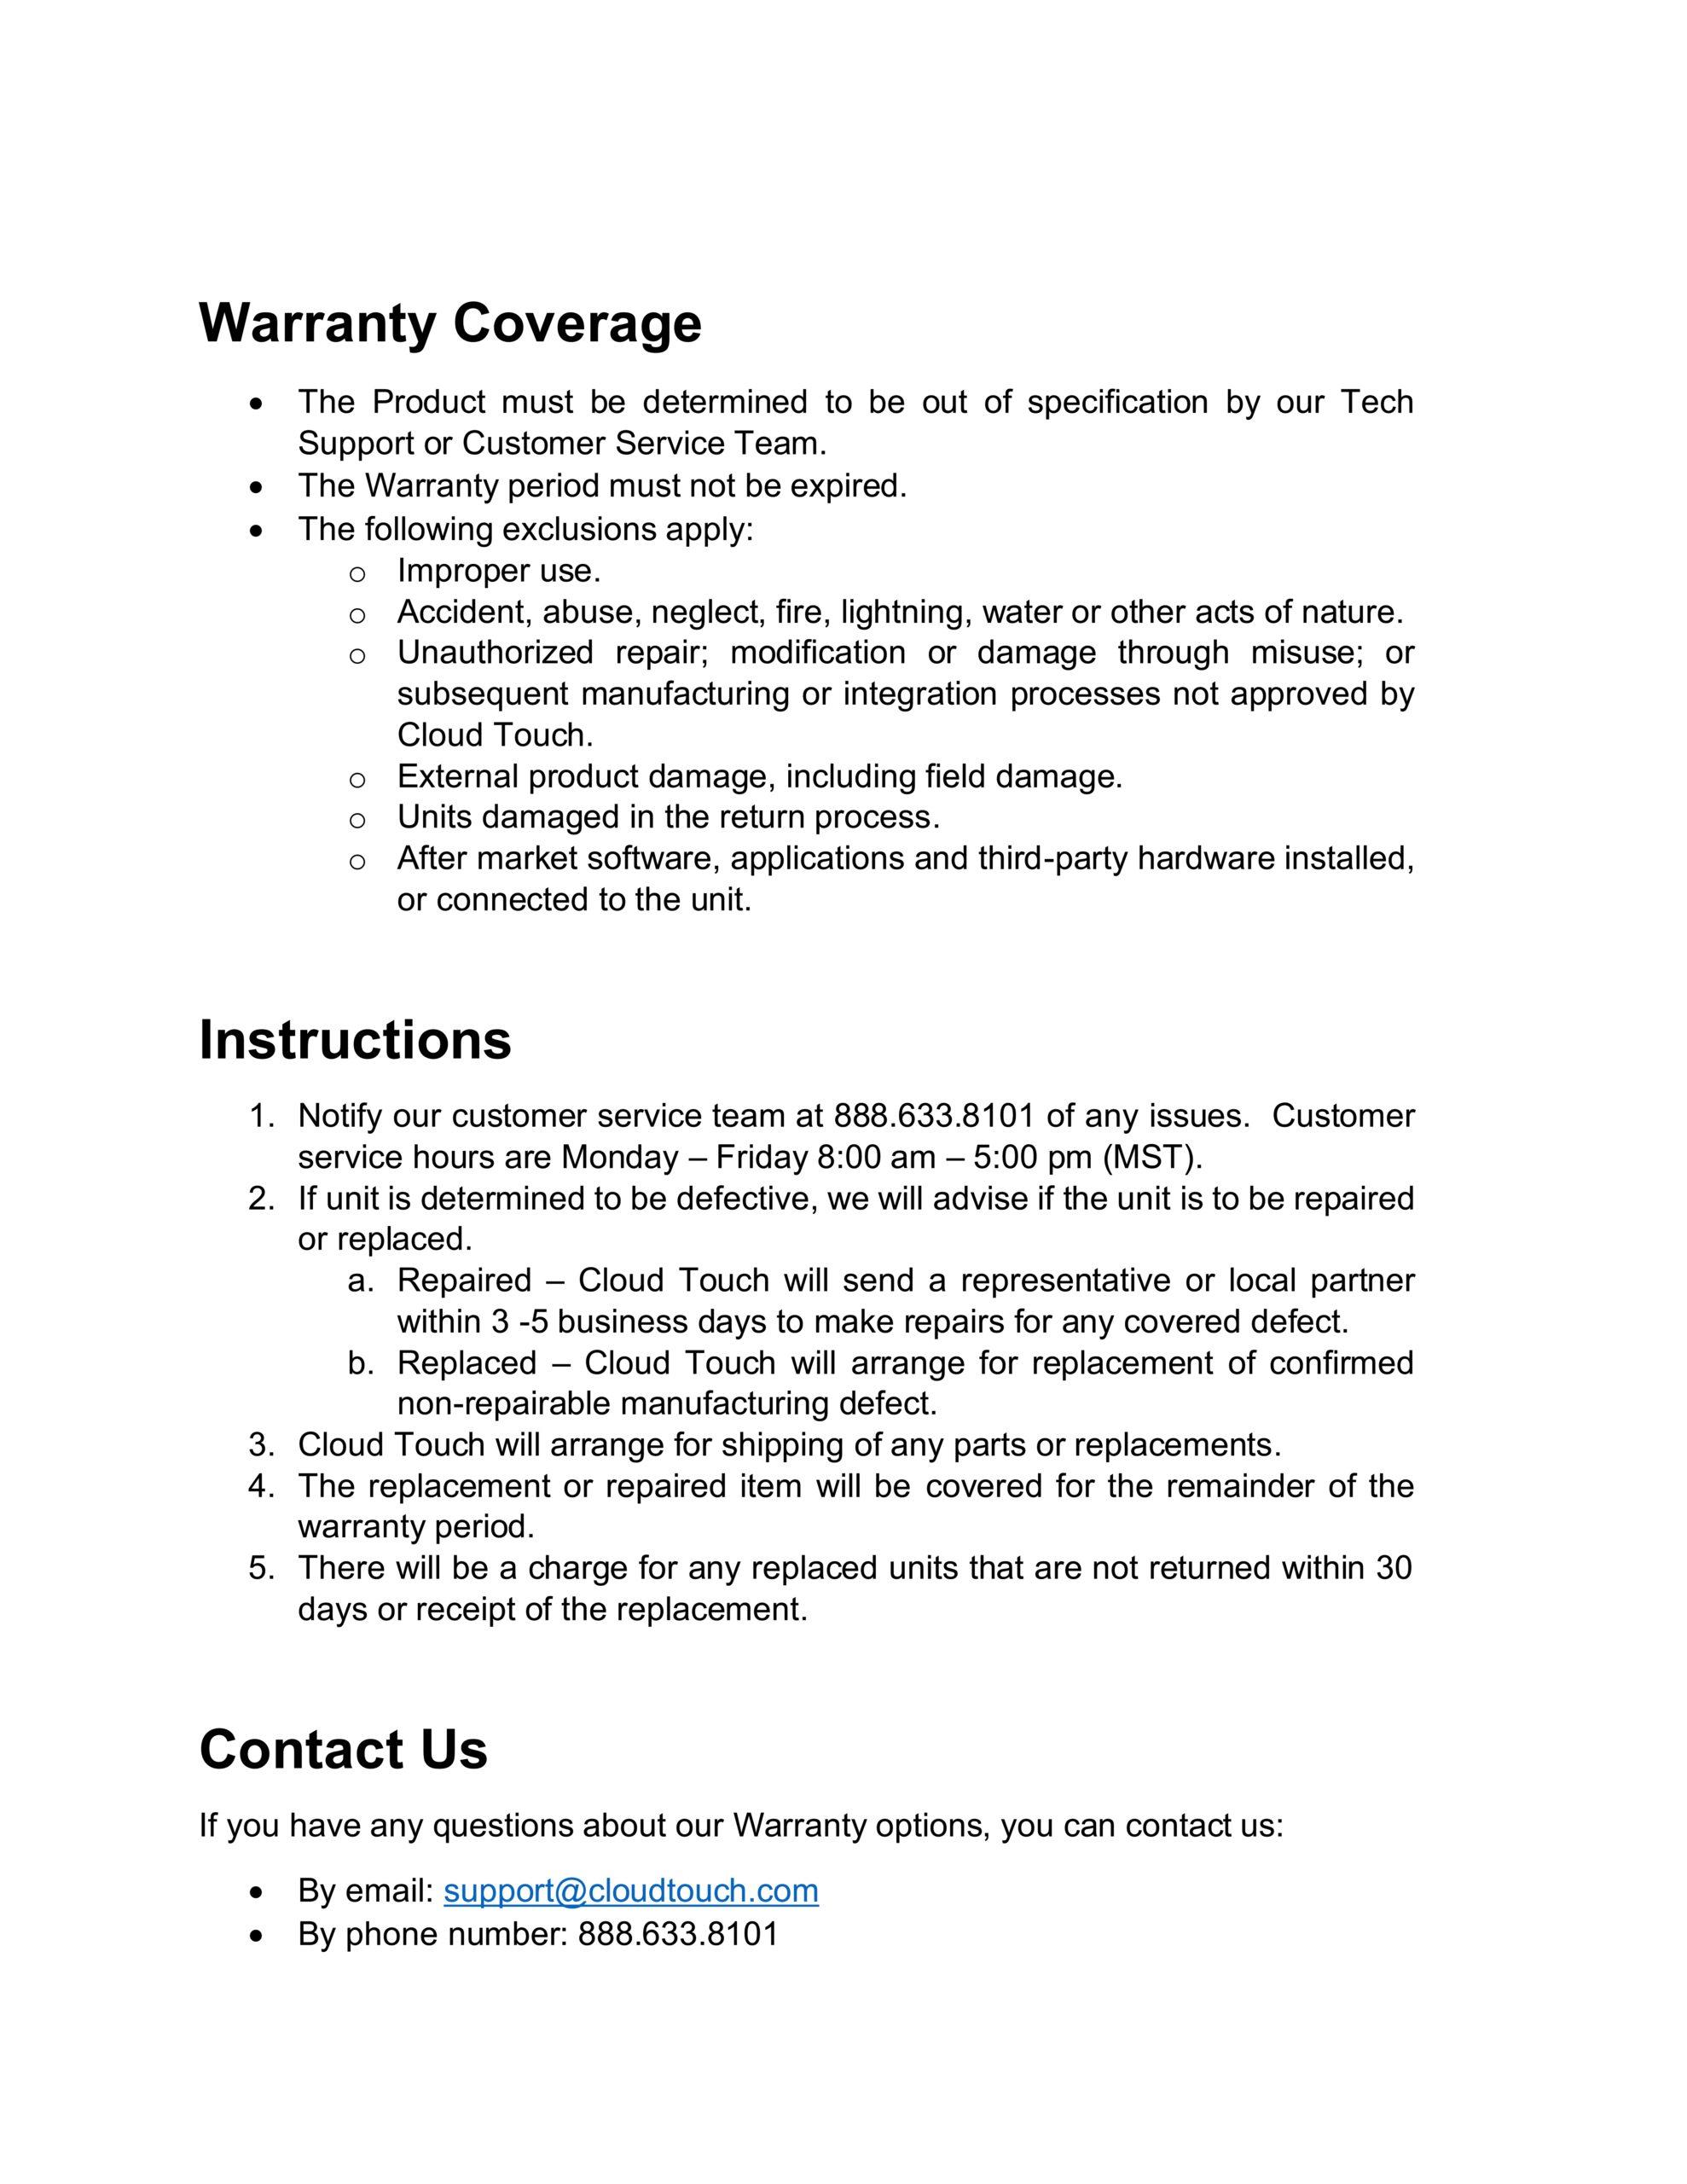 Cloud_Touch_Warranty_2020_002-scaled.jpg